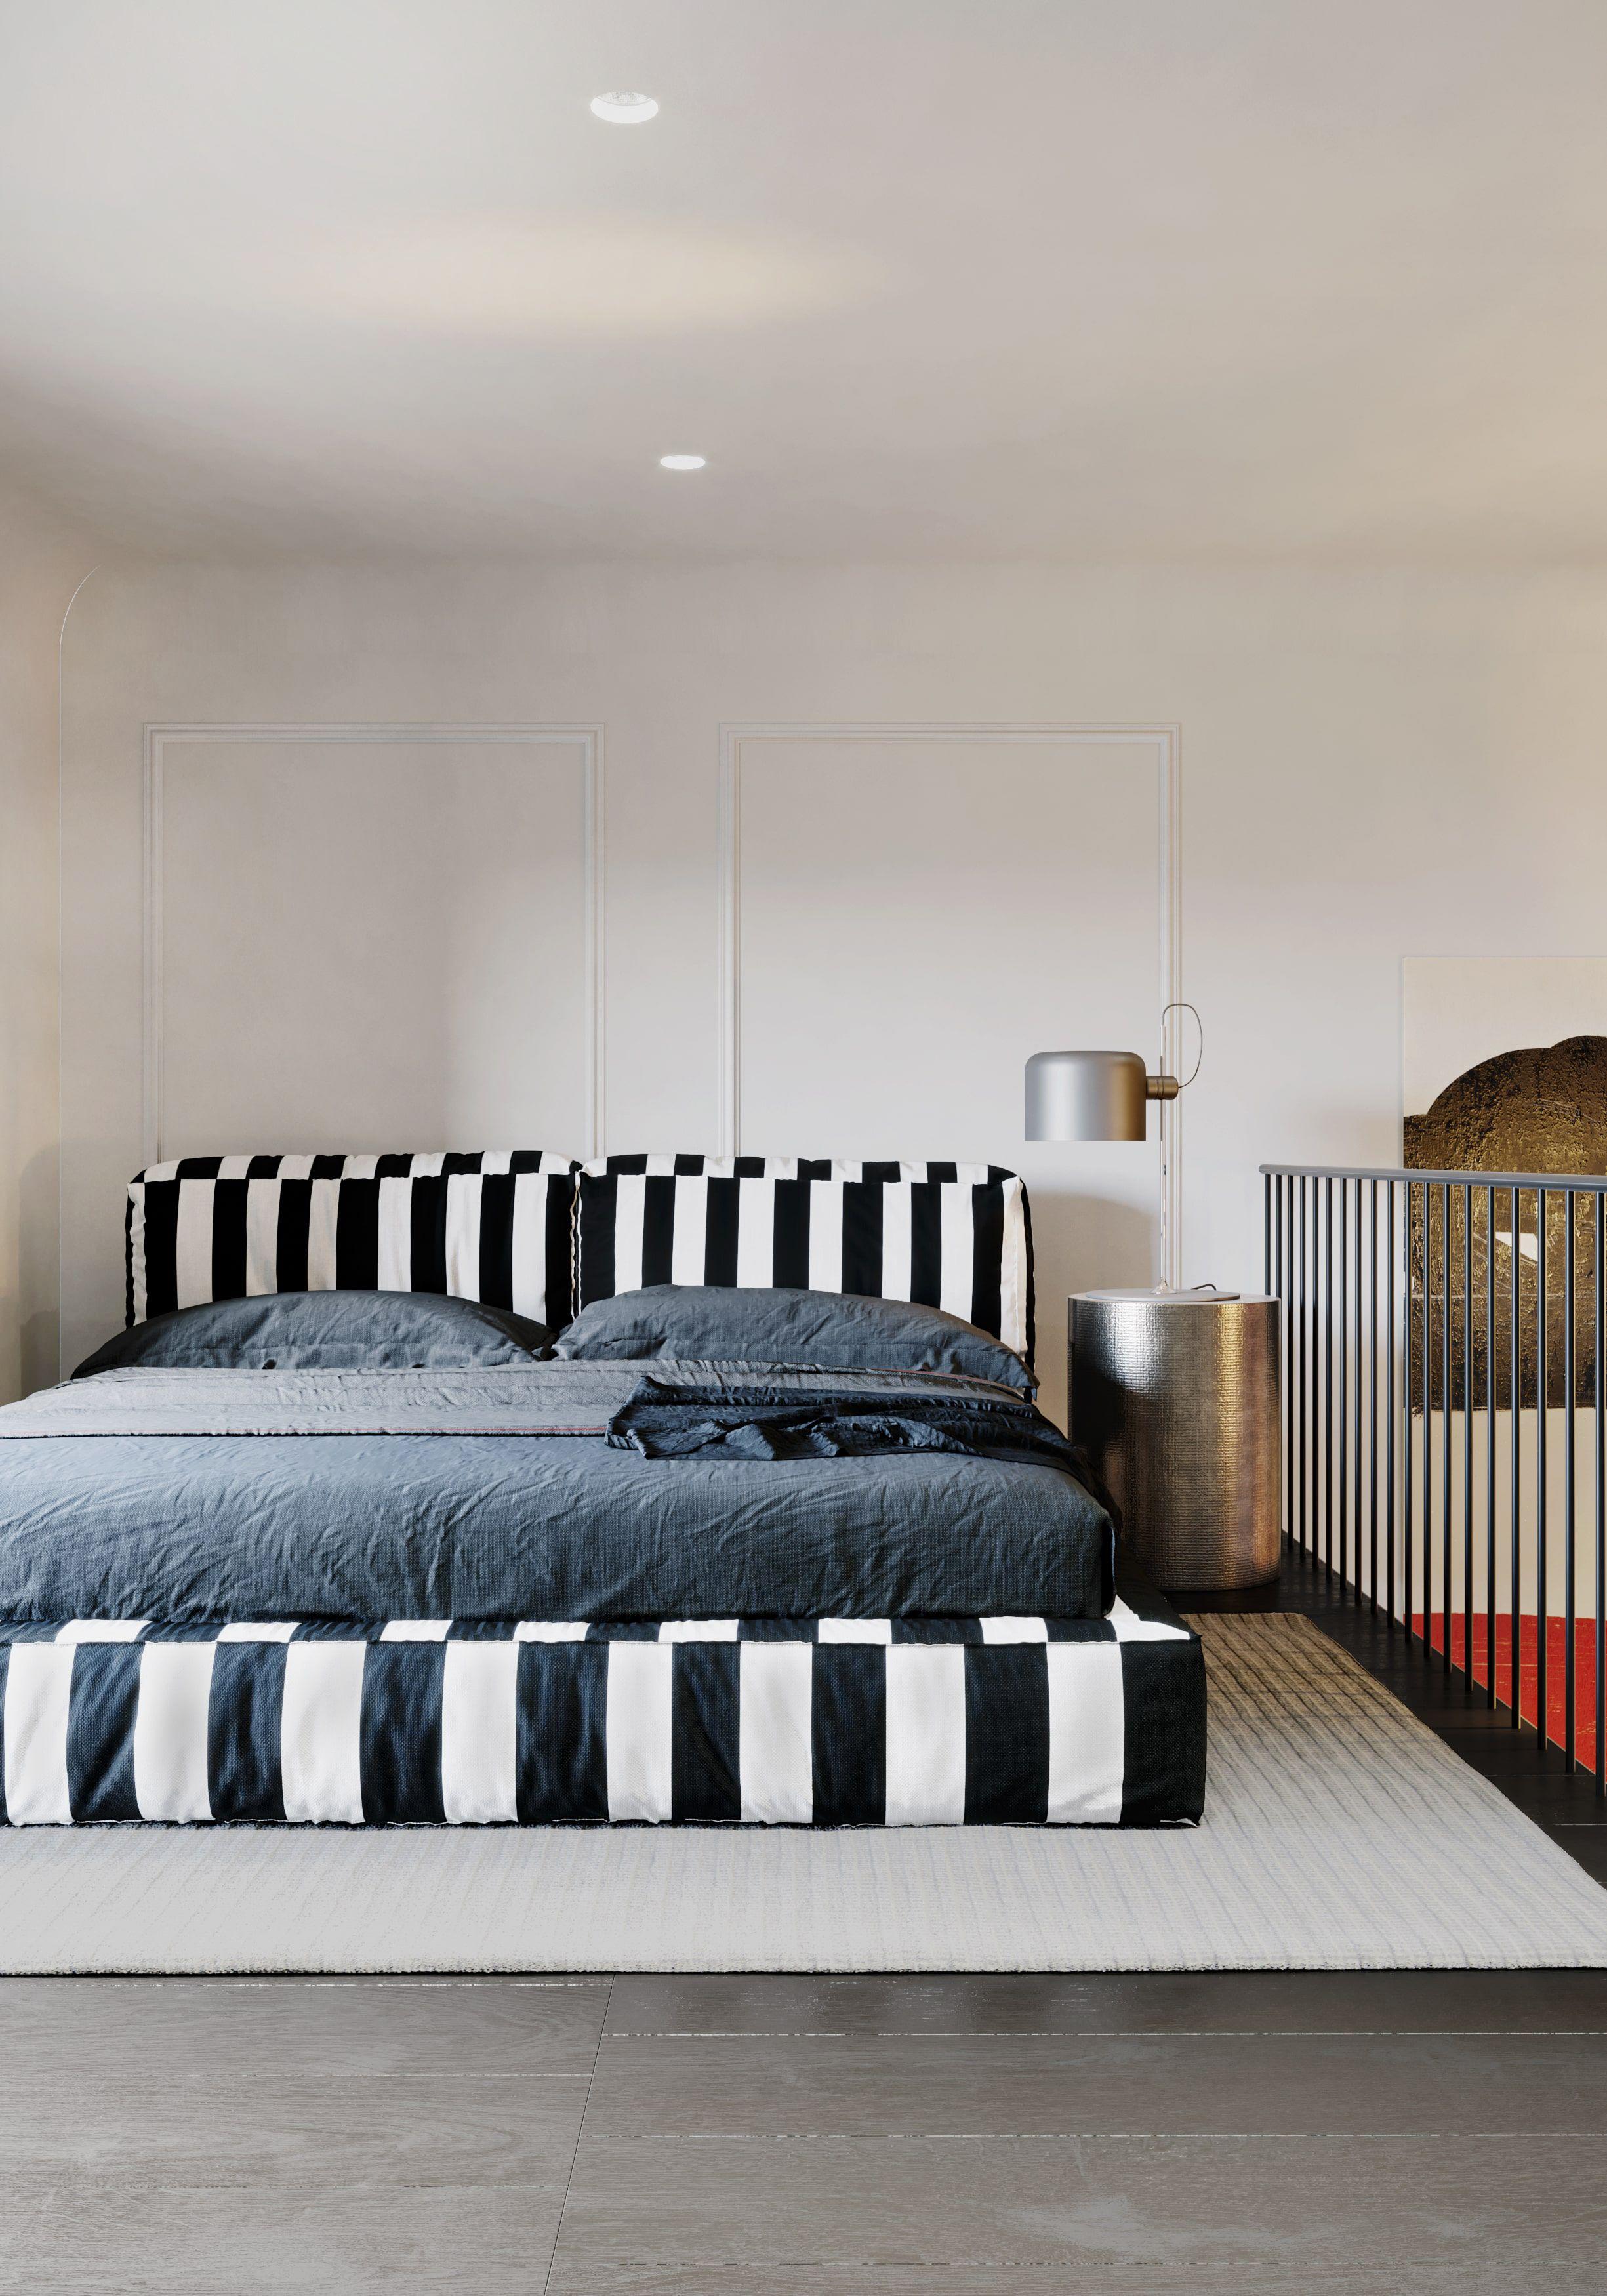 How To Decorate A Loft 12 Stylish Loft Apartment Design Ideas